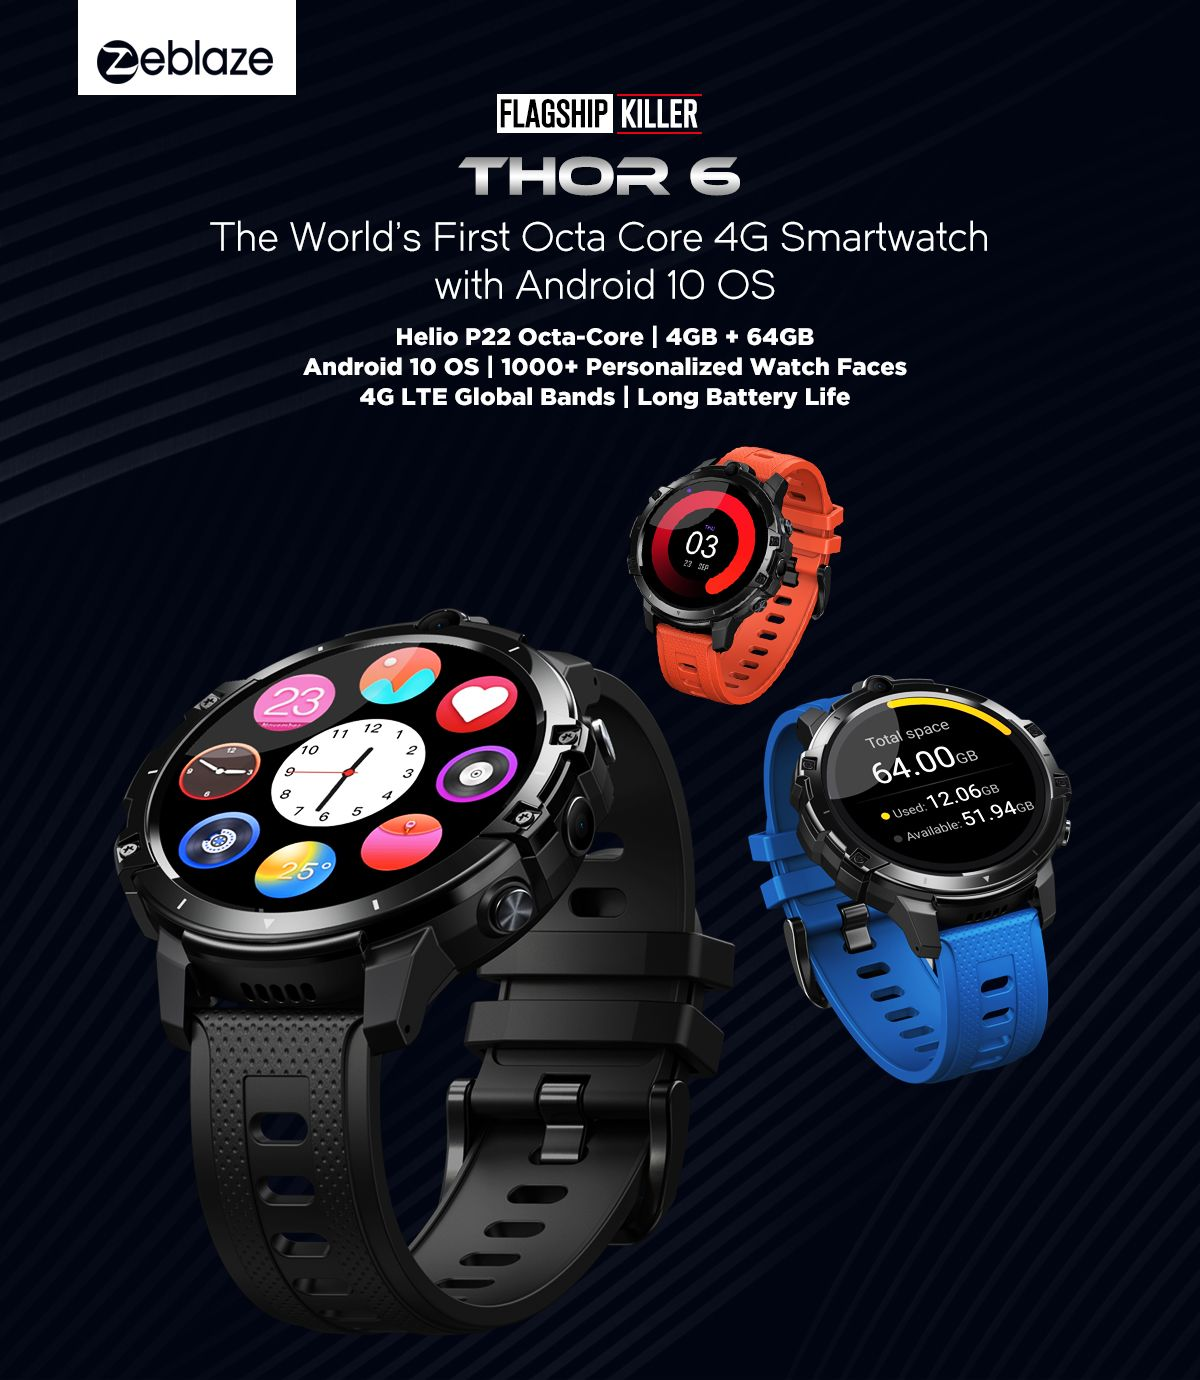 images?q=tbn:ANd9GcQh_l3eQ5xwiPy07kGEXjmjgmBKBRB7H2mRxCGhv1tFWg5c_mWT Smart Watch 4gb Ram